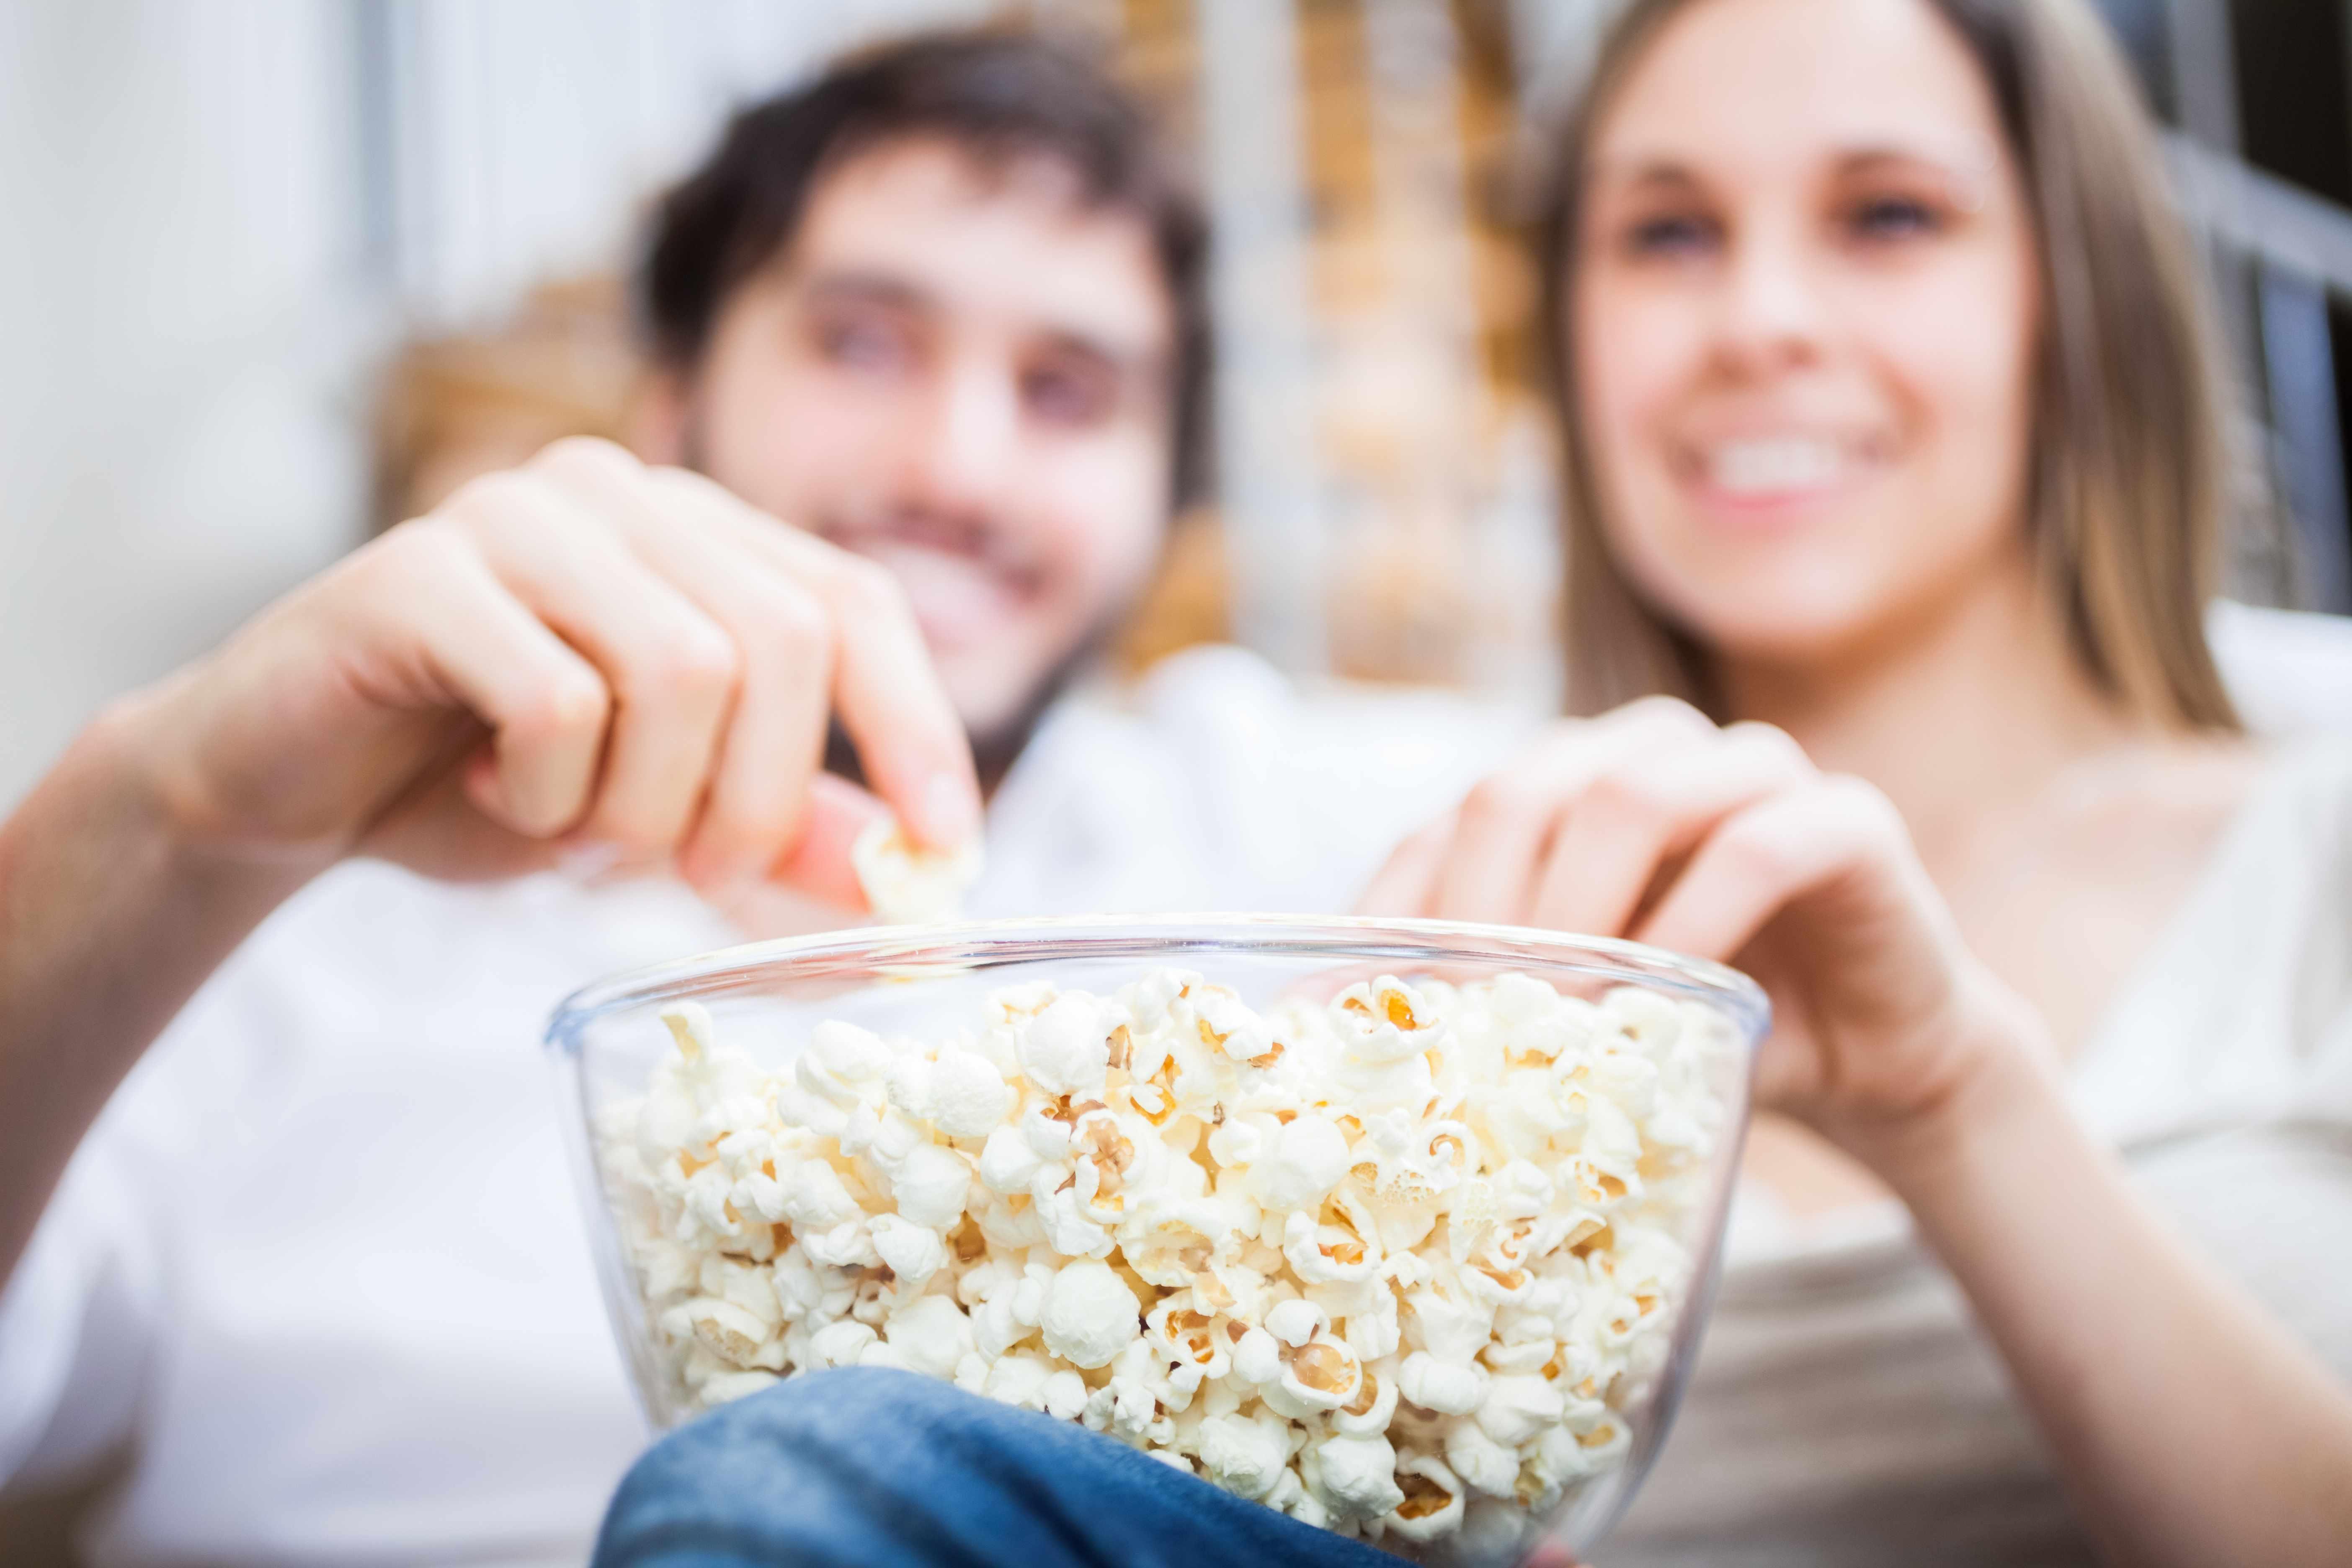 couple enjoying eating a bowl of popcorn